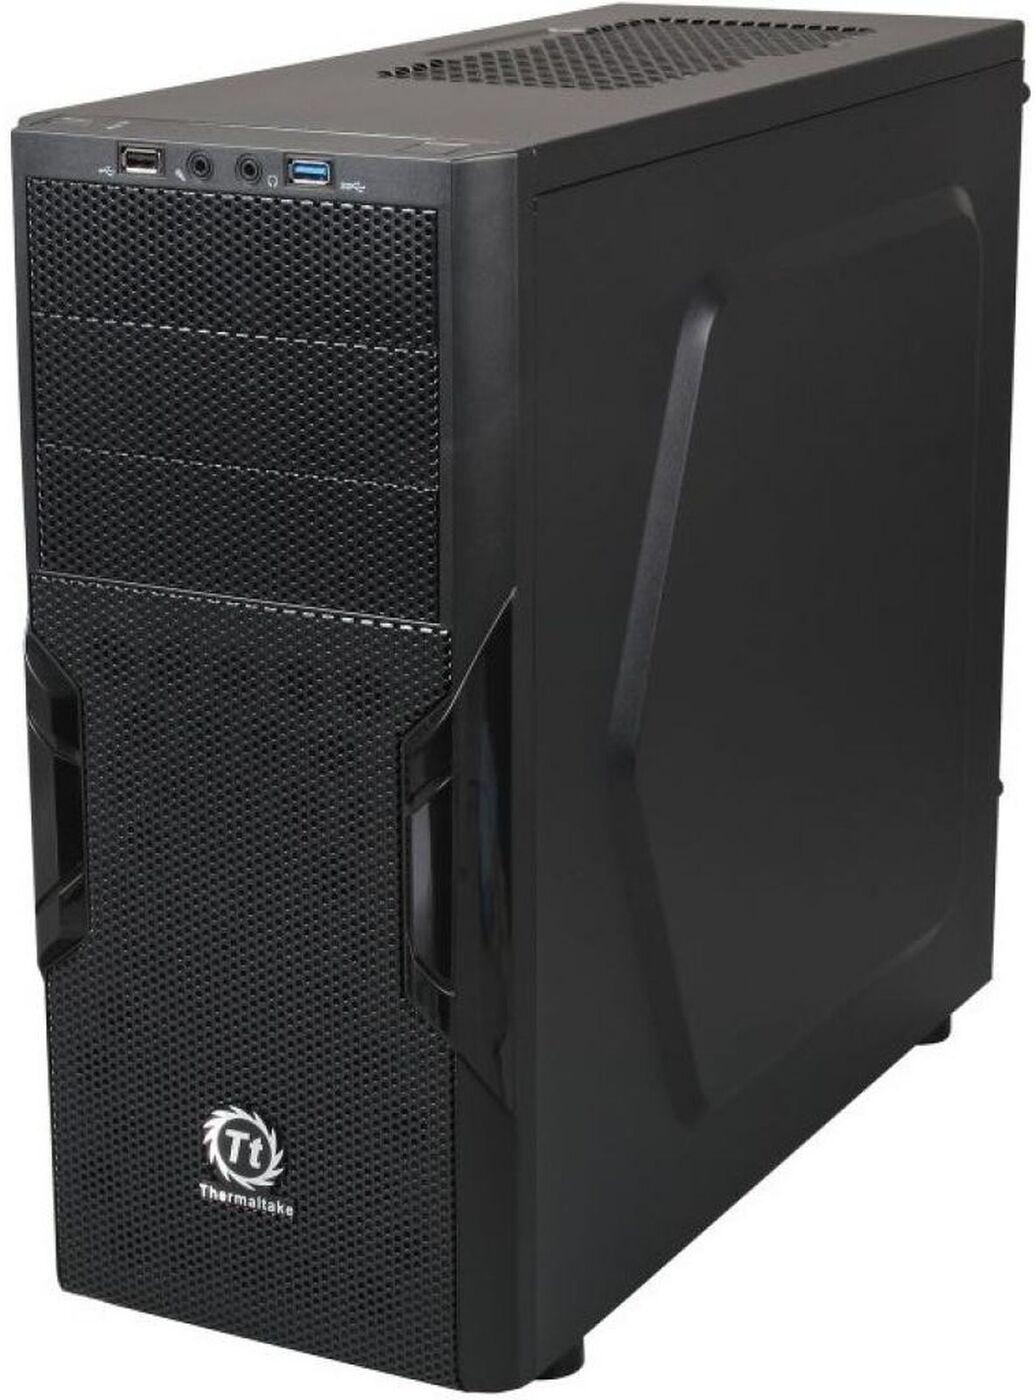 Корпус компьютерный Thermaltake Versa H22/Black/No Win/SECC, CA-1B3-00M1NN-00